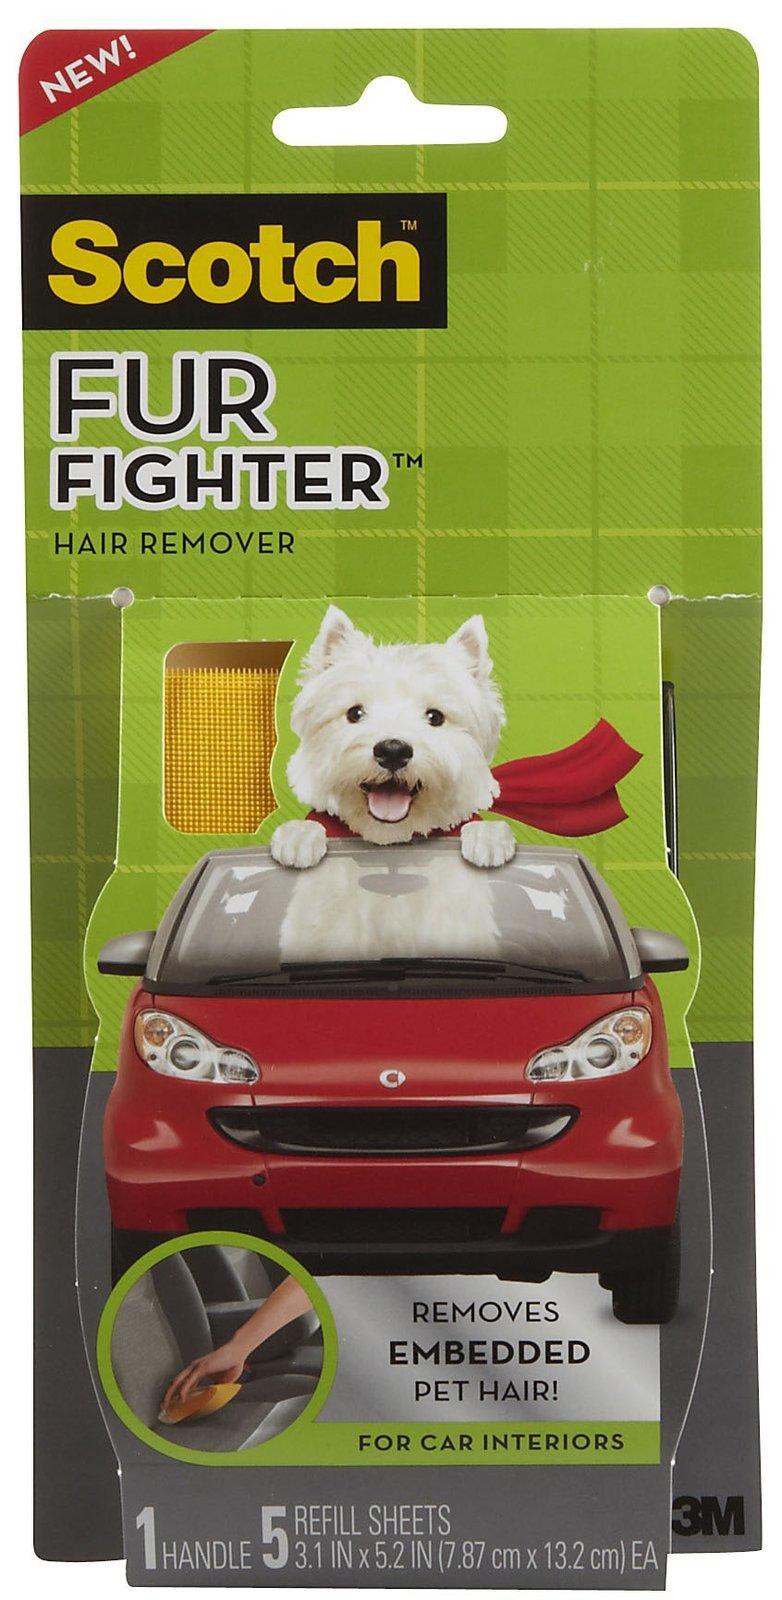 Scotch(TM) Fur Fighter(TM) Hair Remover